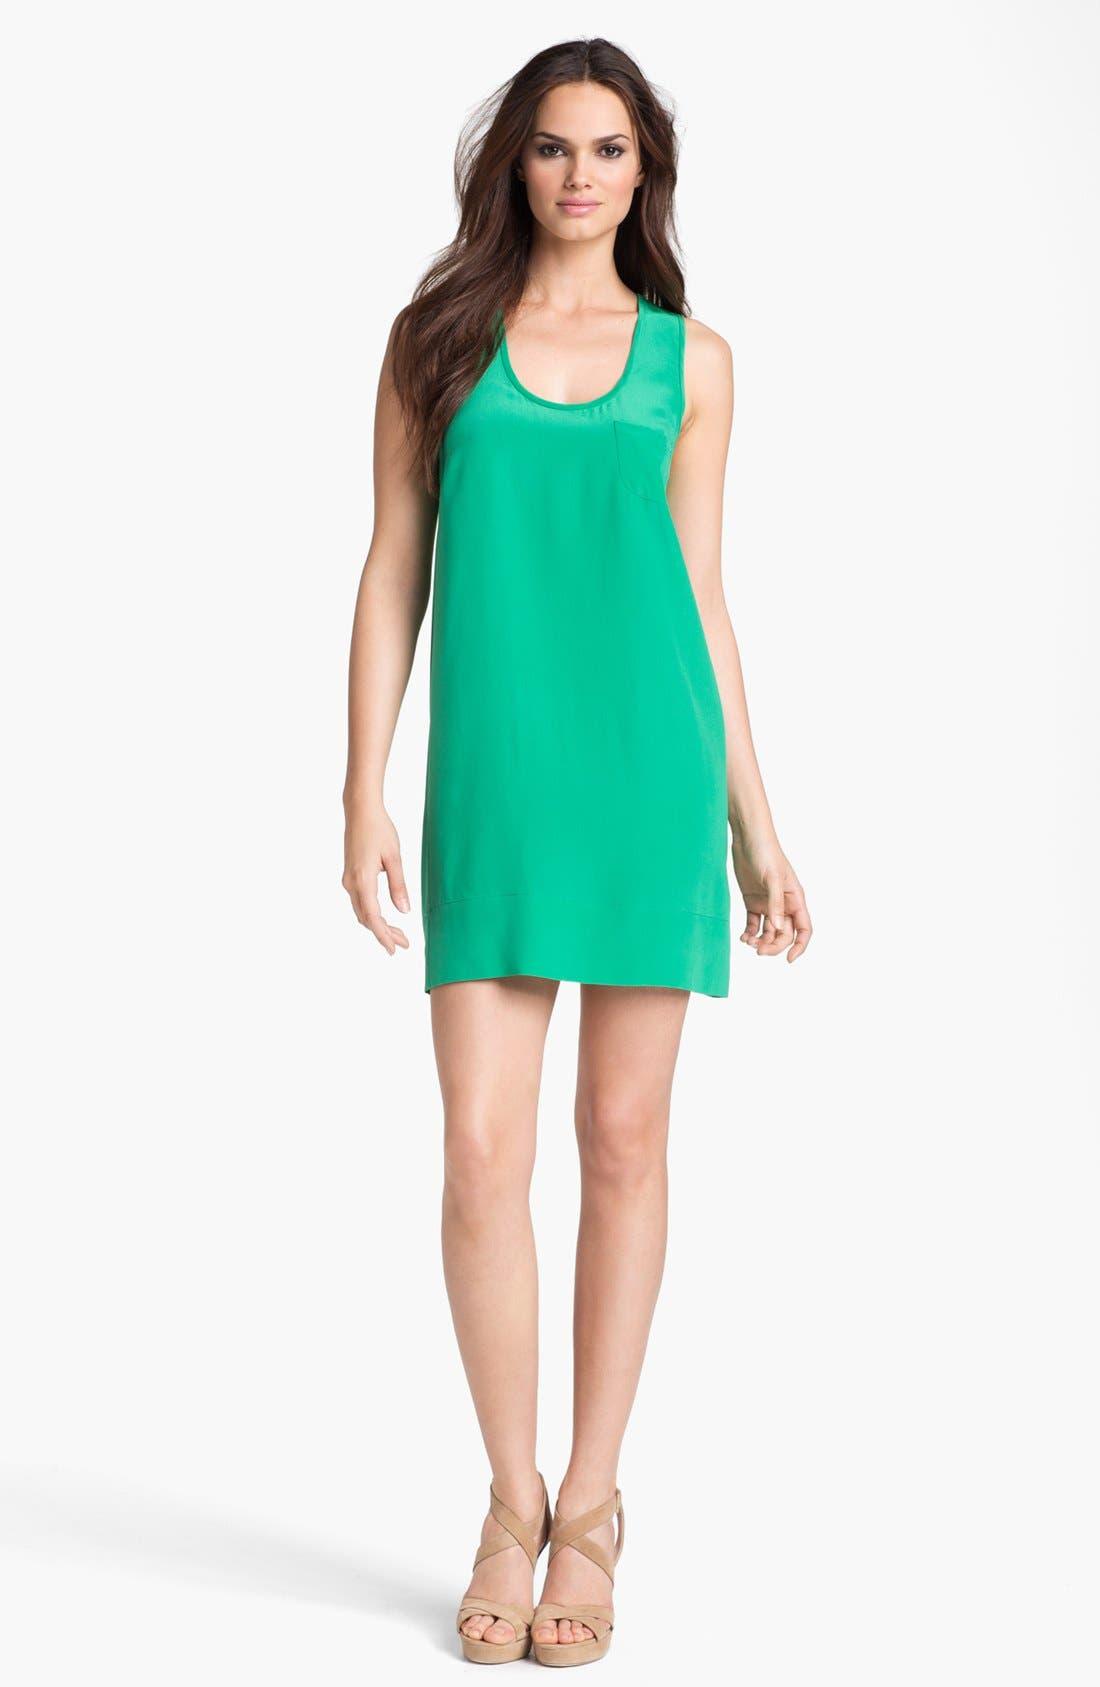 Alternate Image 1 Selected - Joie 'Peri' Silk Tank Dress